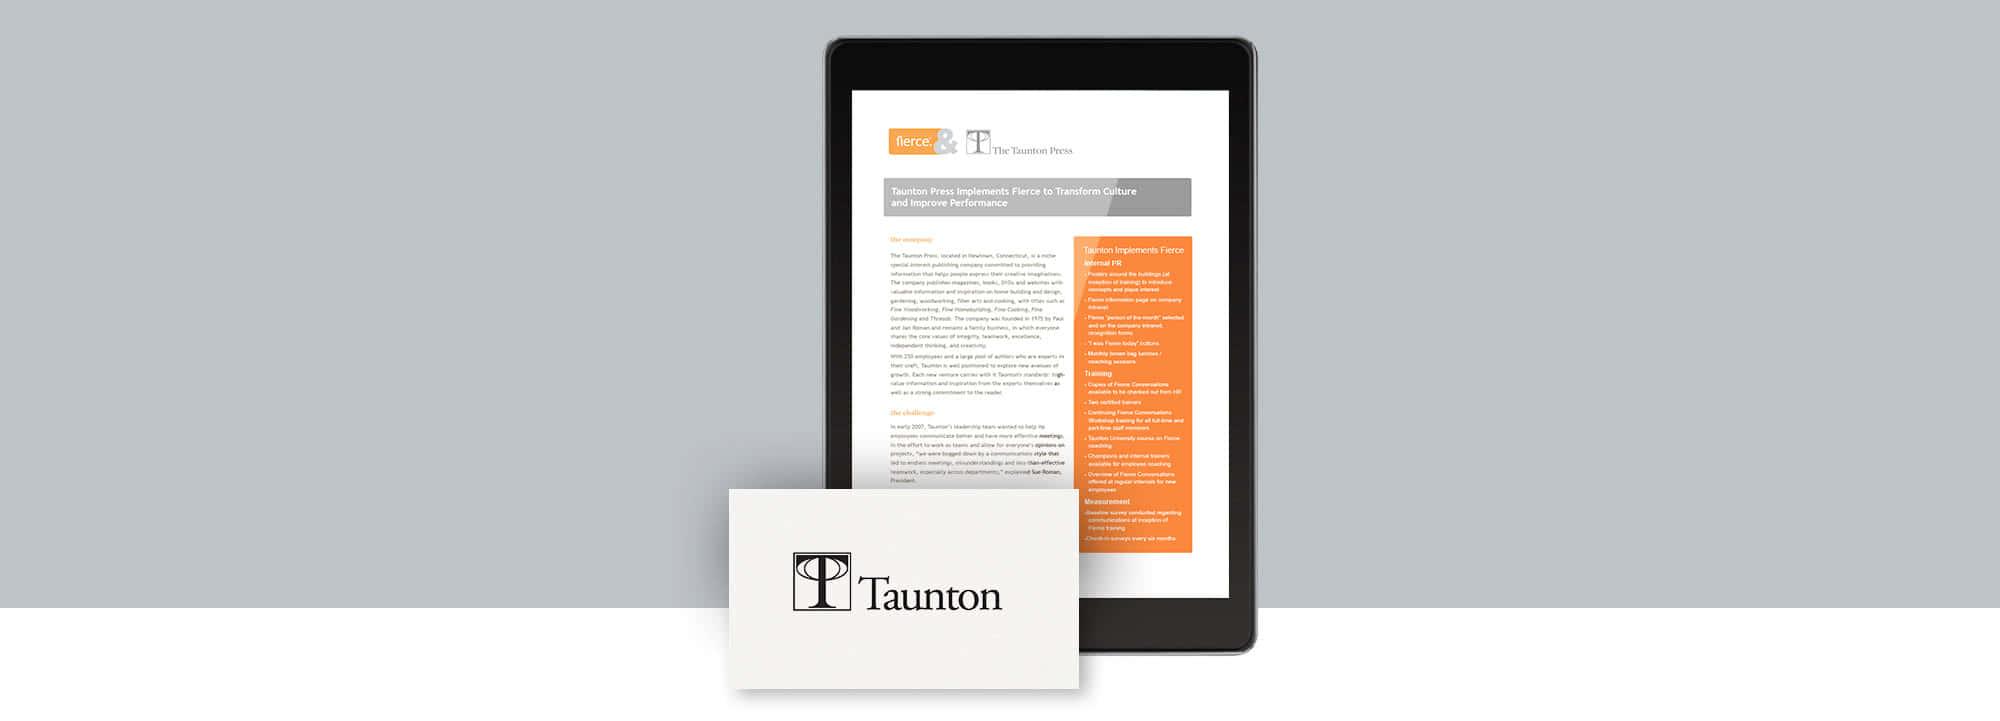 Fierce Conversations Taunton Press Case Study